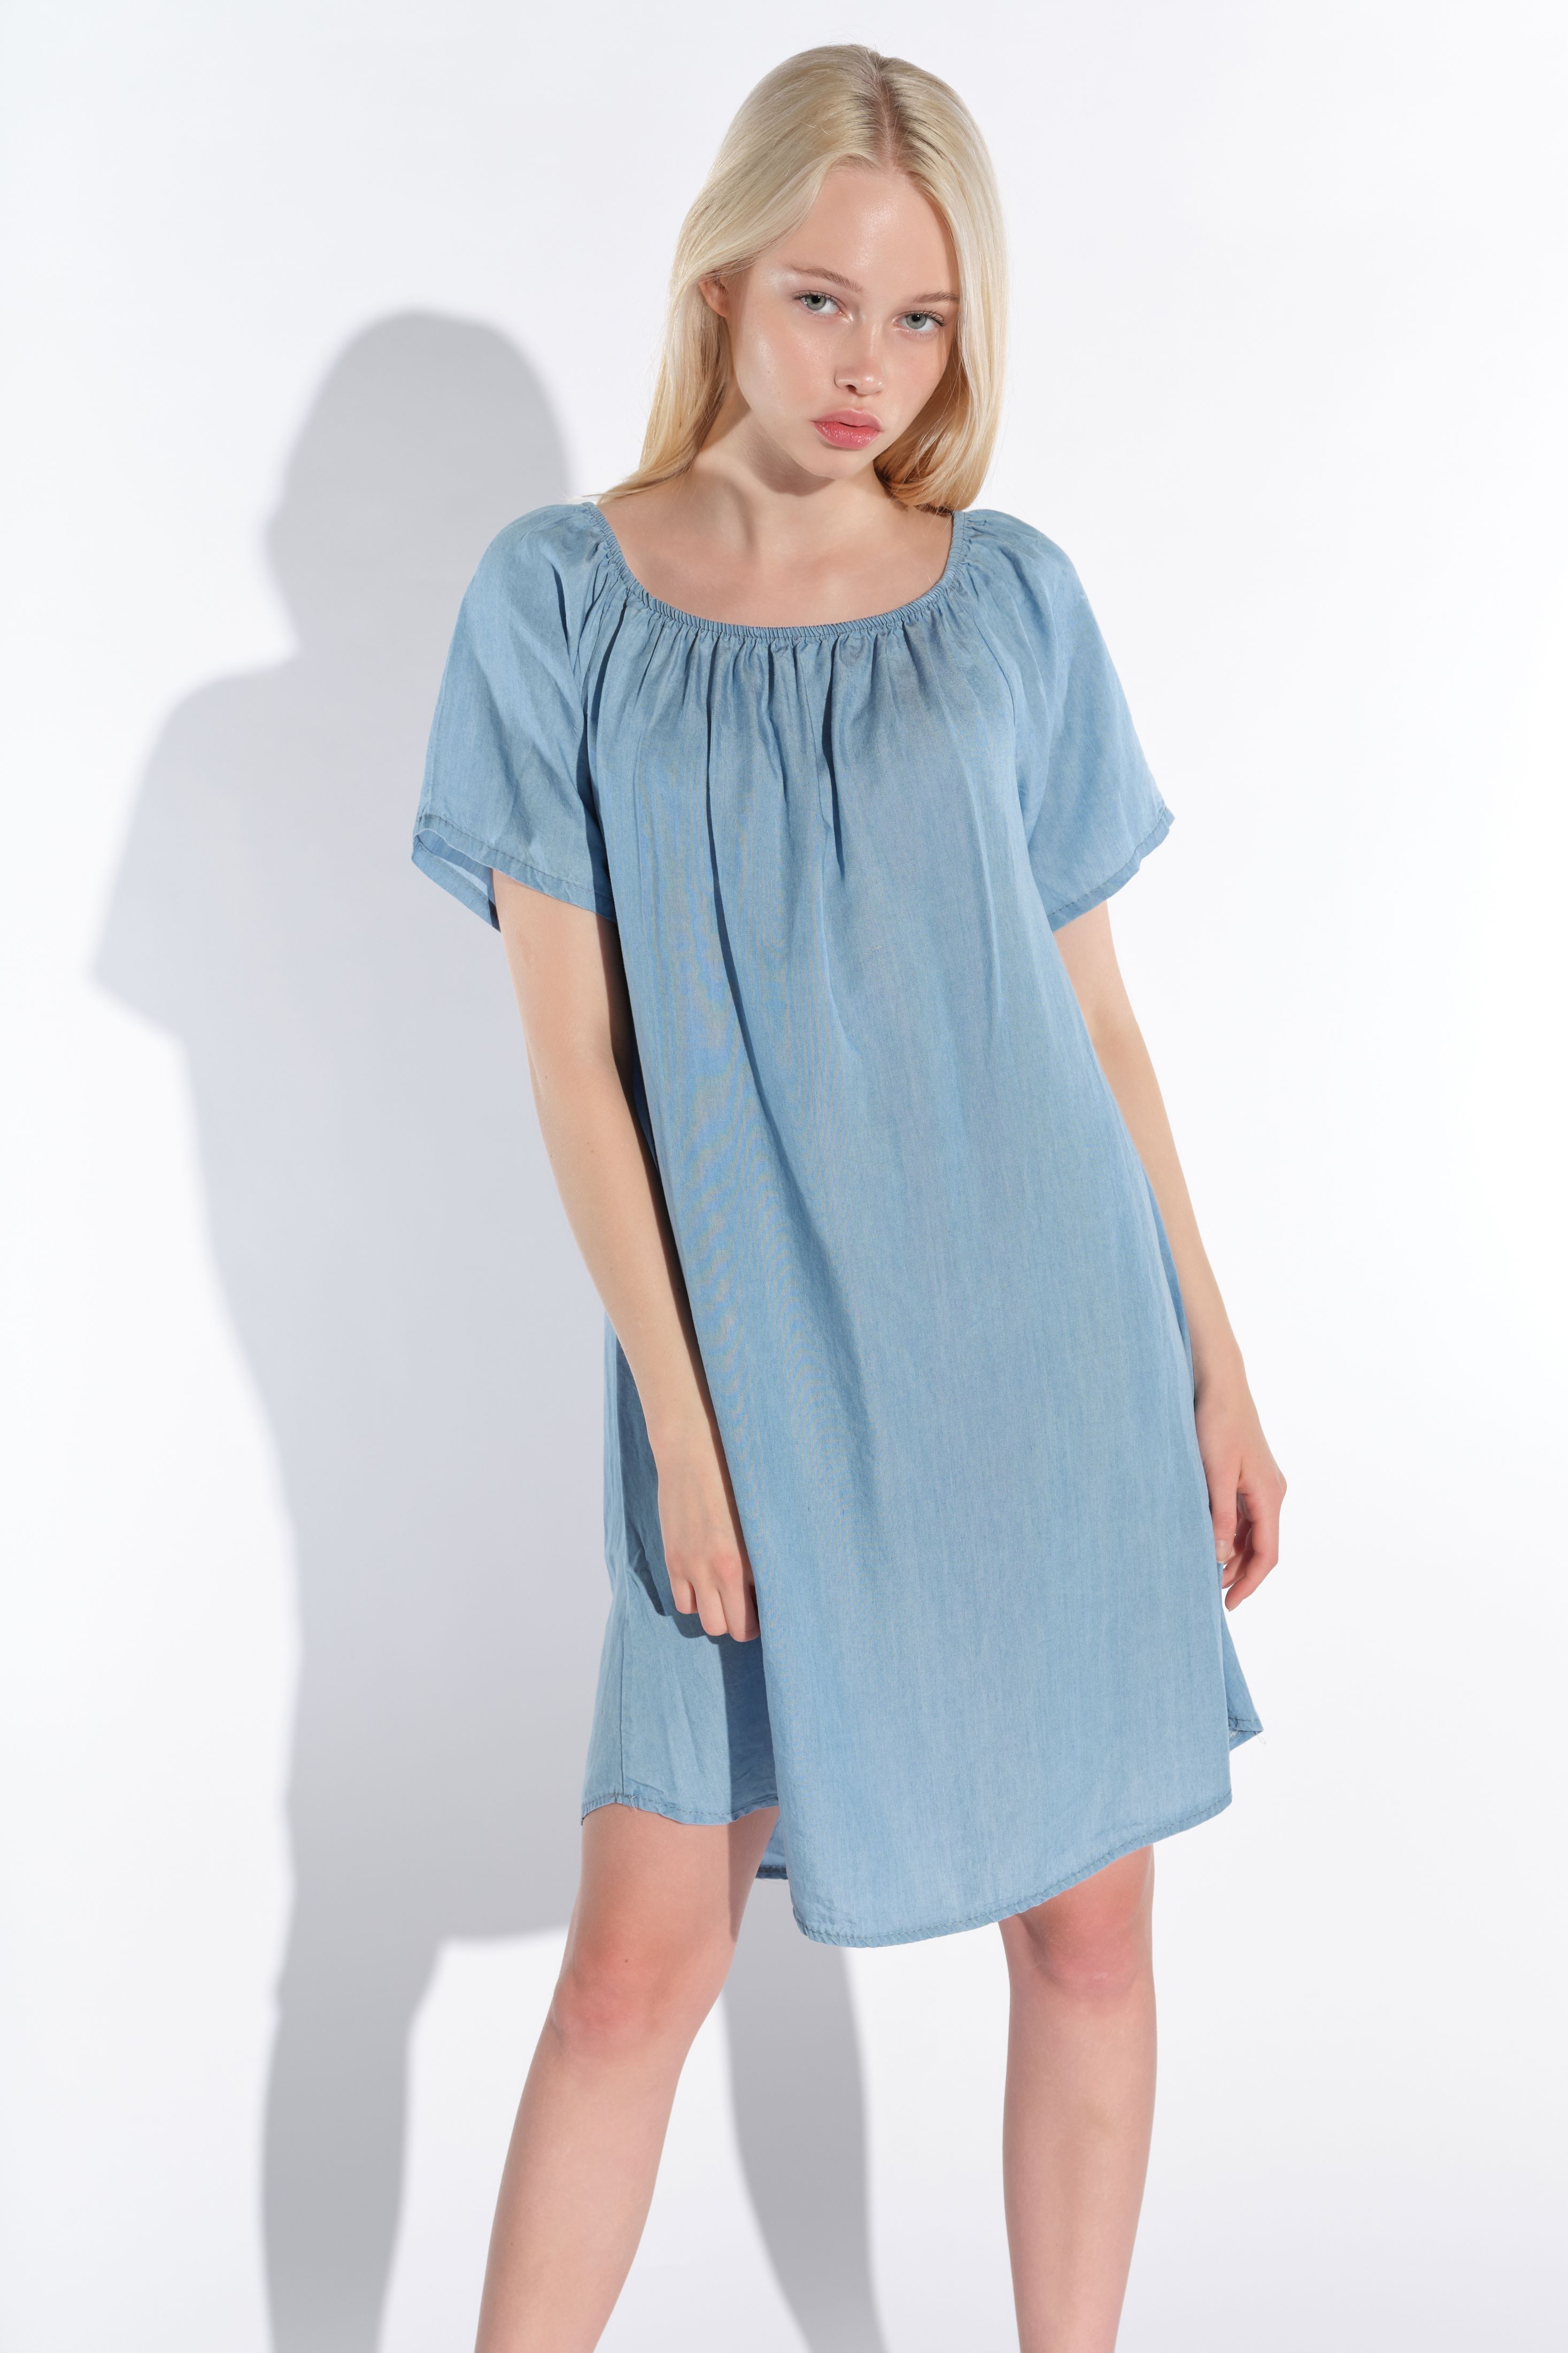 Vestino-Damen-Tunika-Kleid-Mini-Kleid-Jeans-Look-Kurzarm-Tunika-Offshoulder